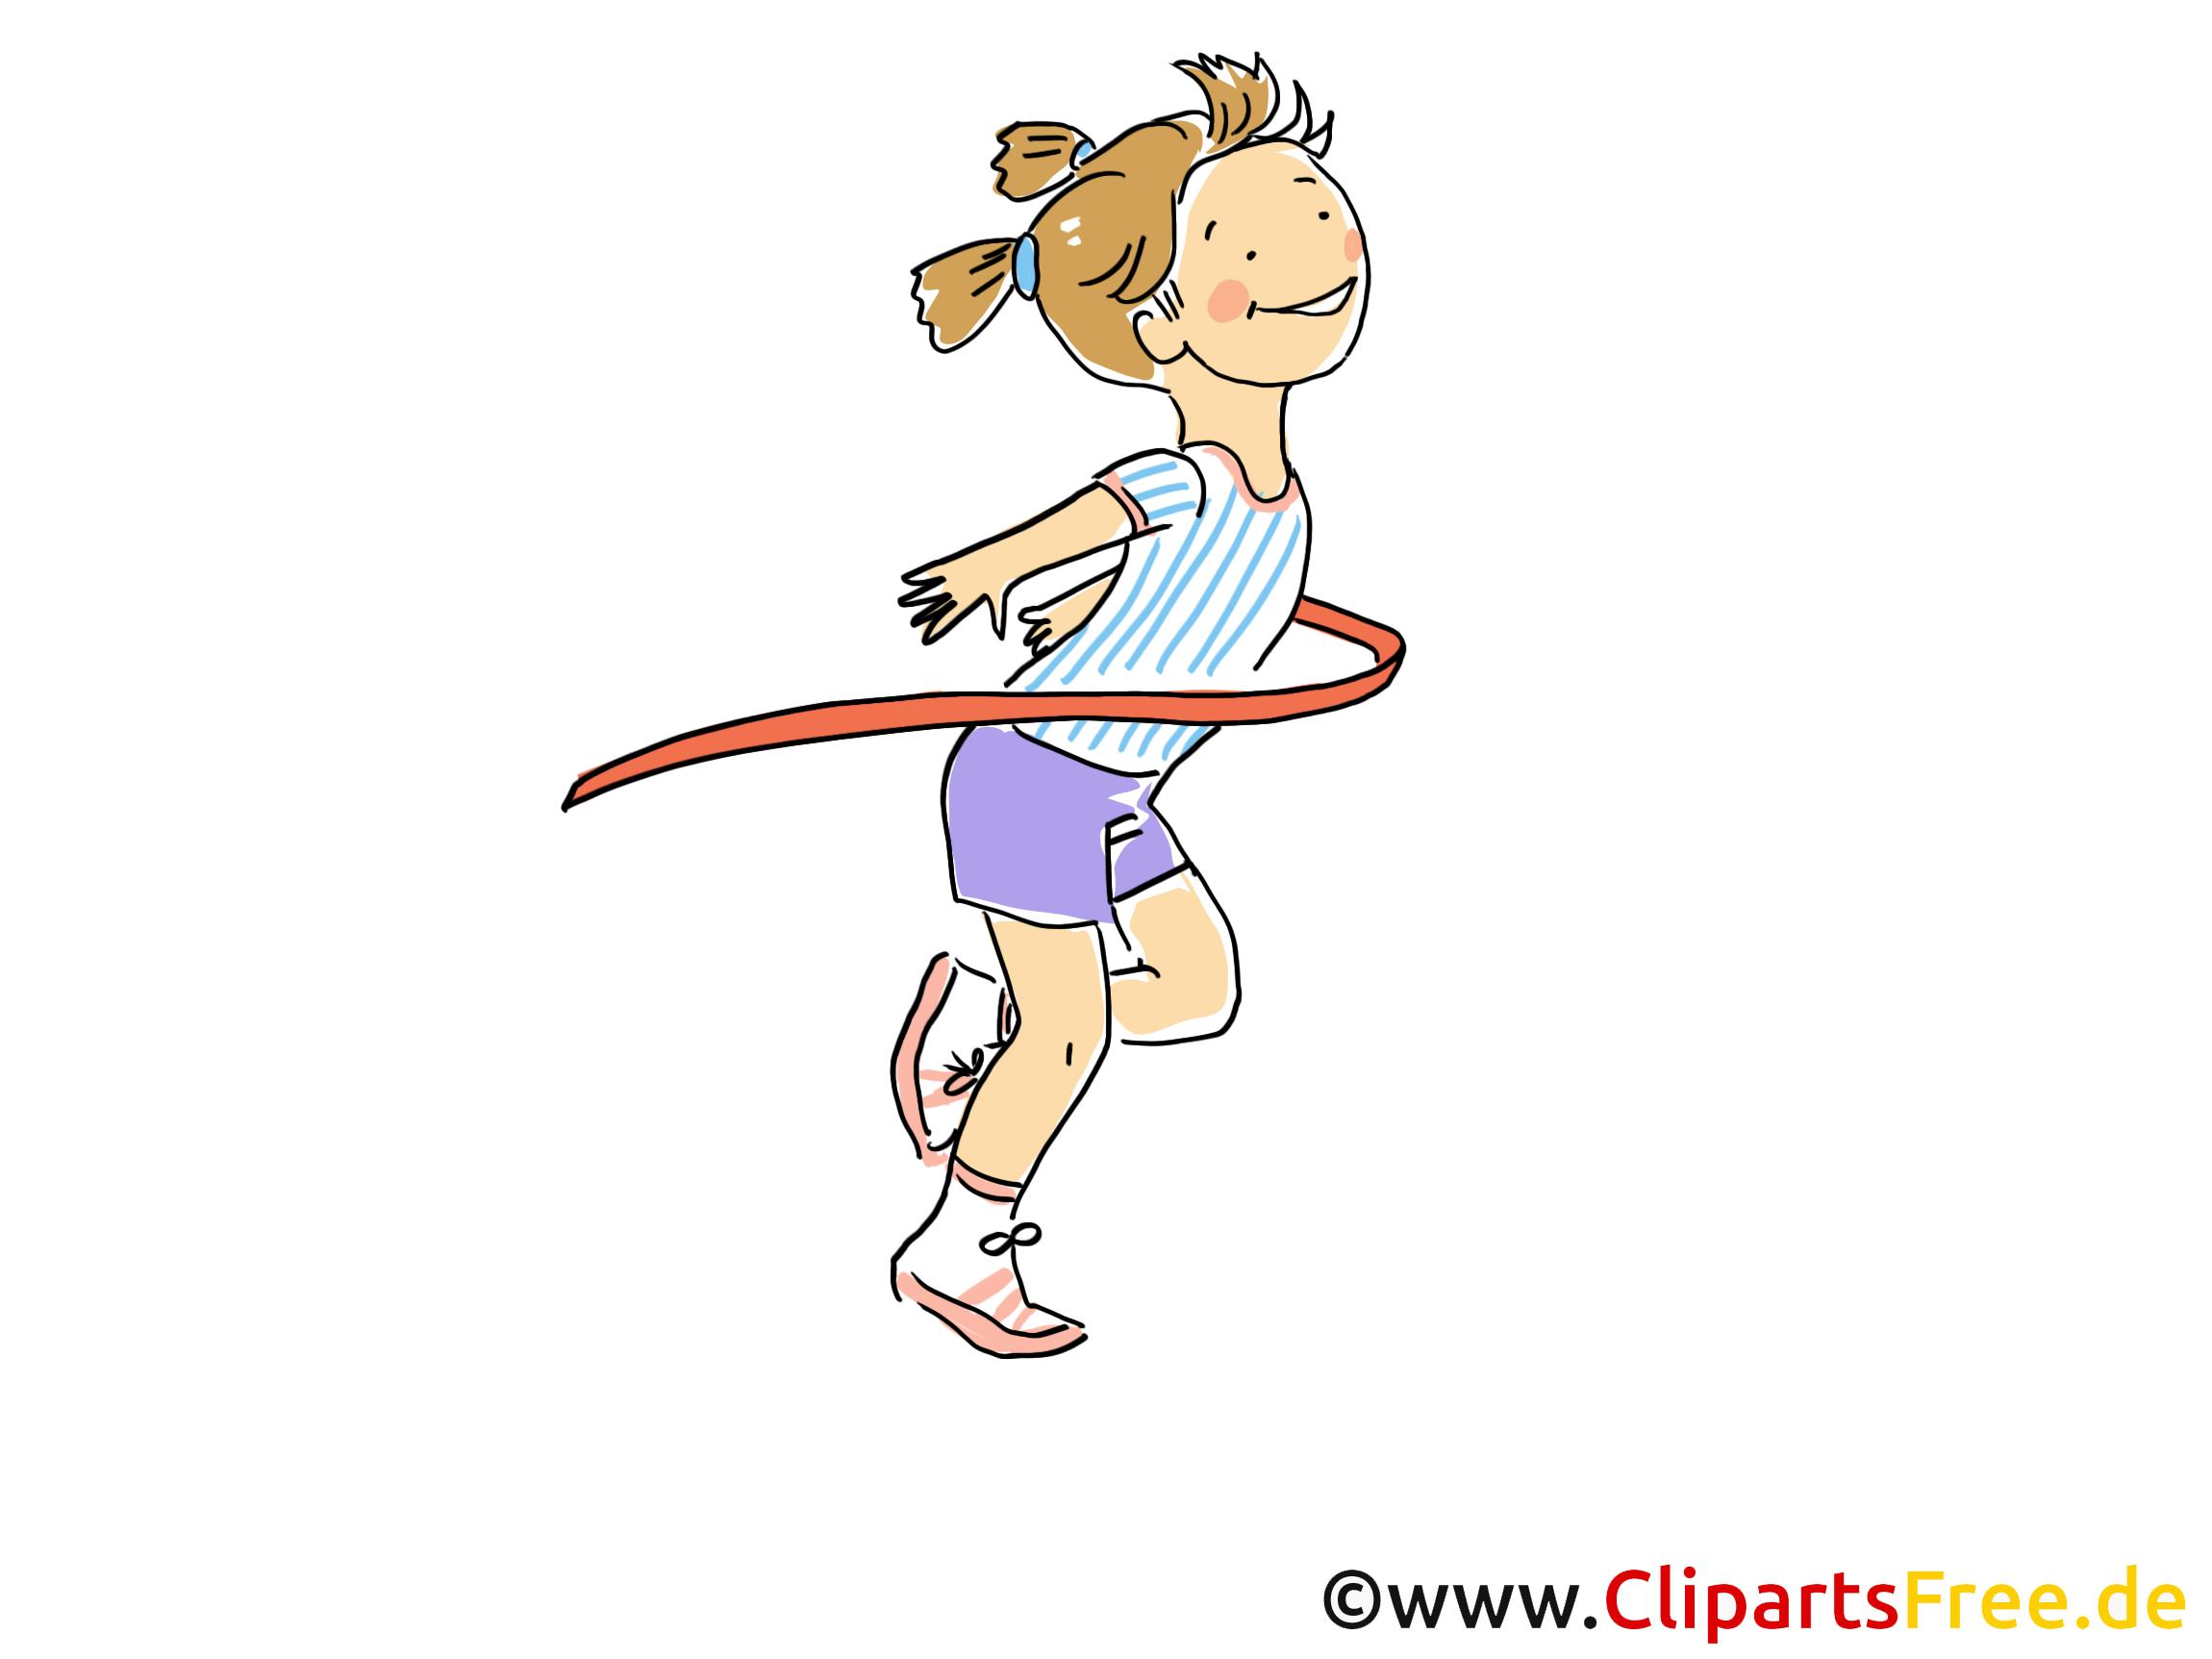 cliparts joggen - photo #30